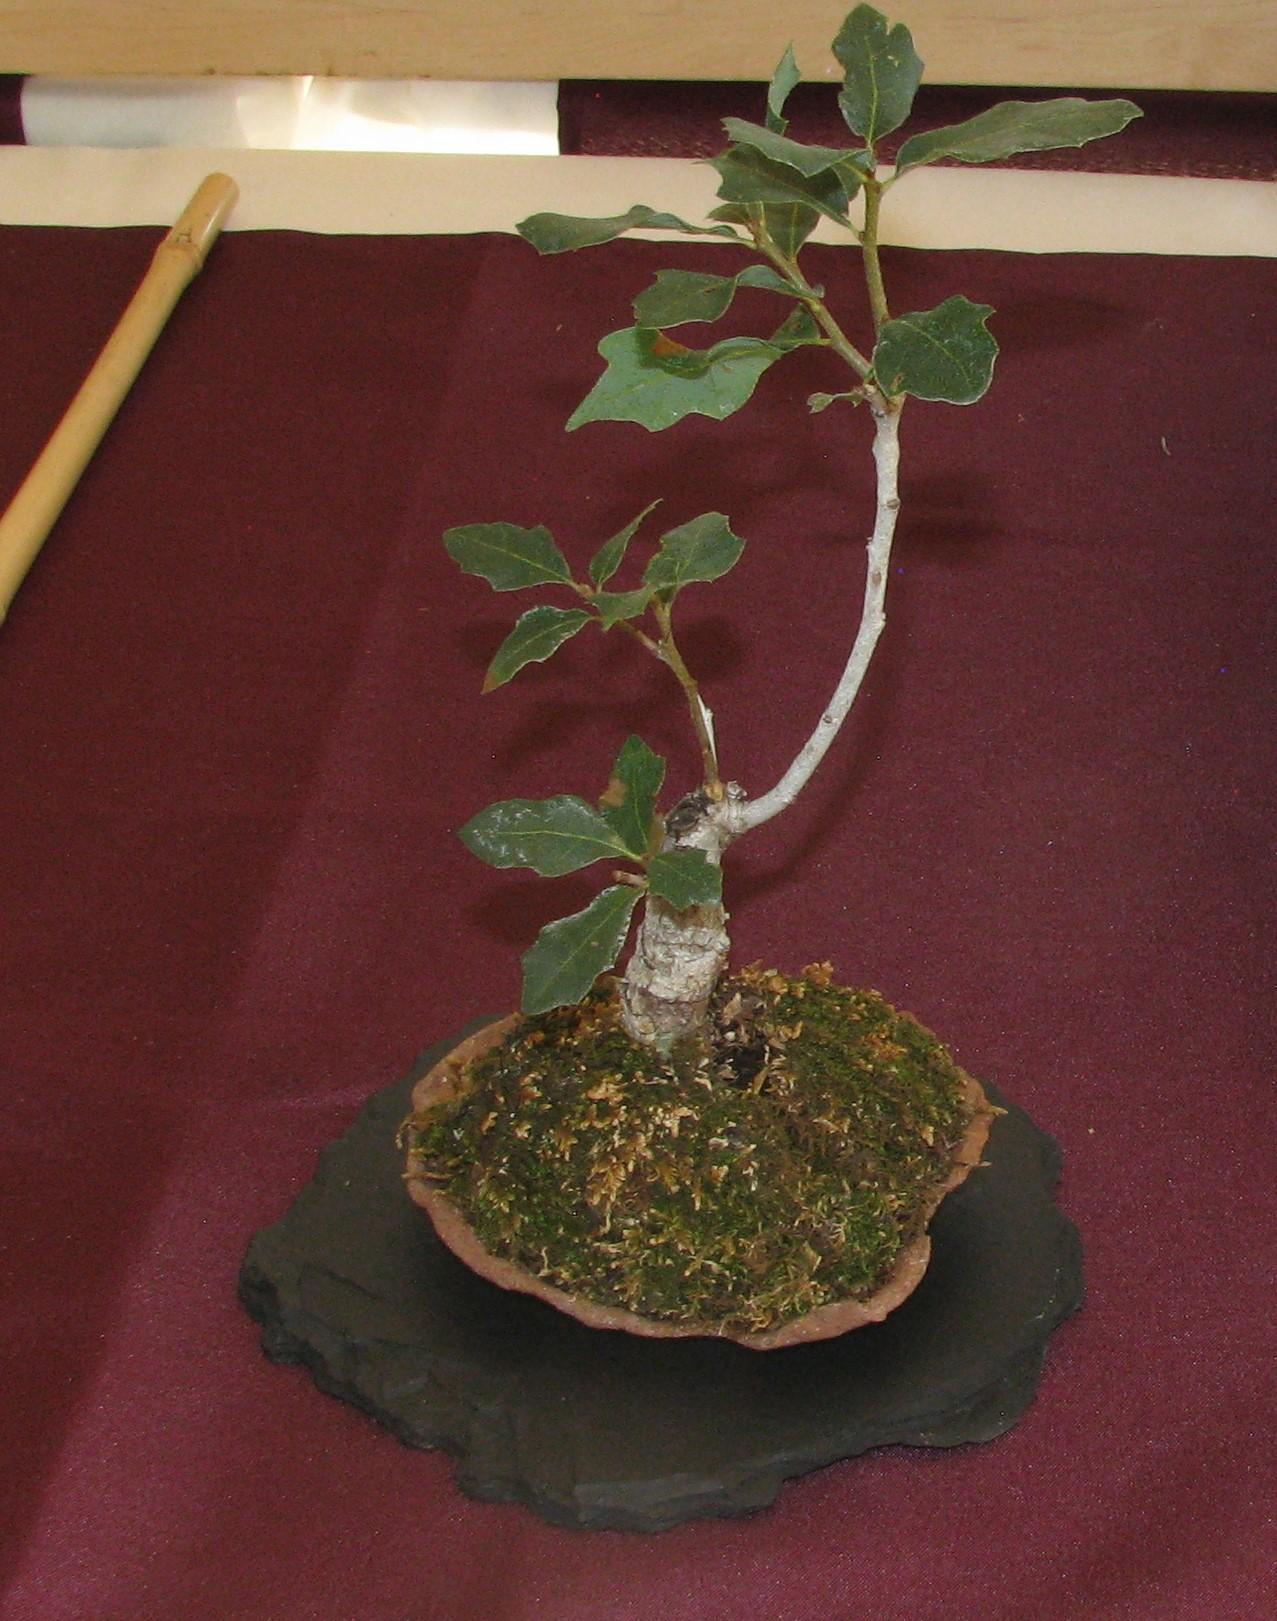 2019 Rocky Mountain Bonsai Society Accent Plants Colorado Rocky Mountain Bonsai Suiseki